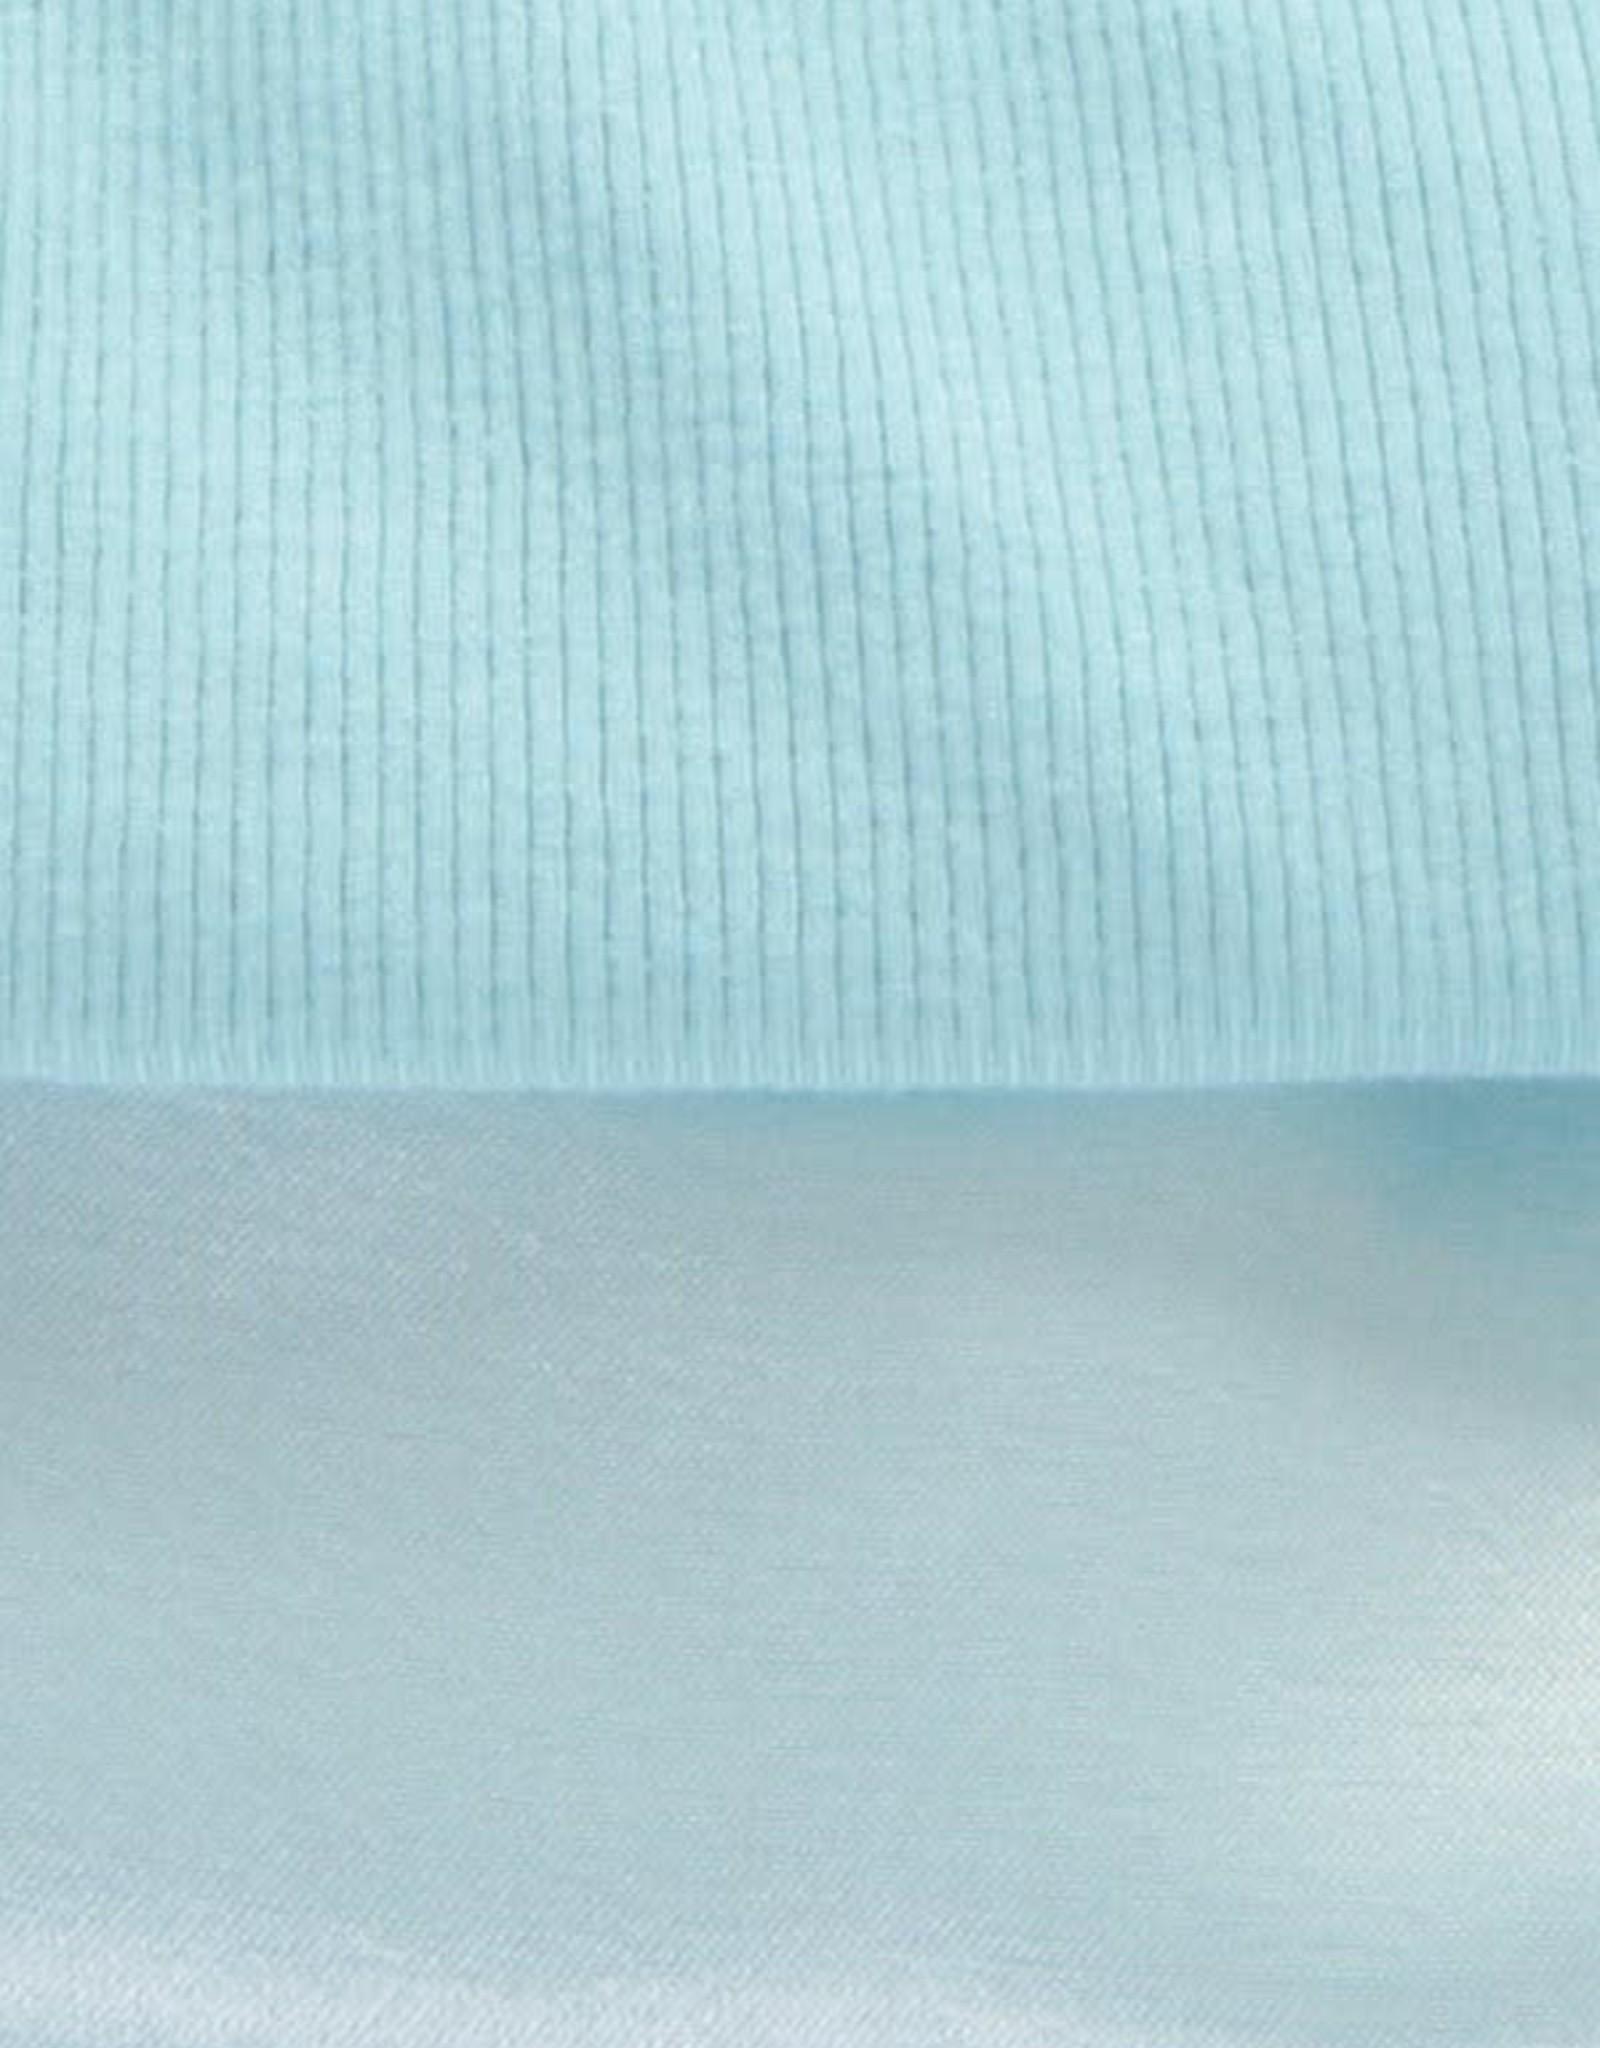 PJ Harlow PJ Harlow Dena Rib Knit Sweatpant